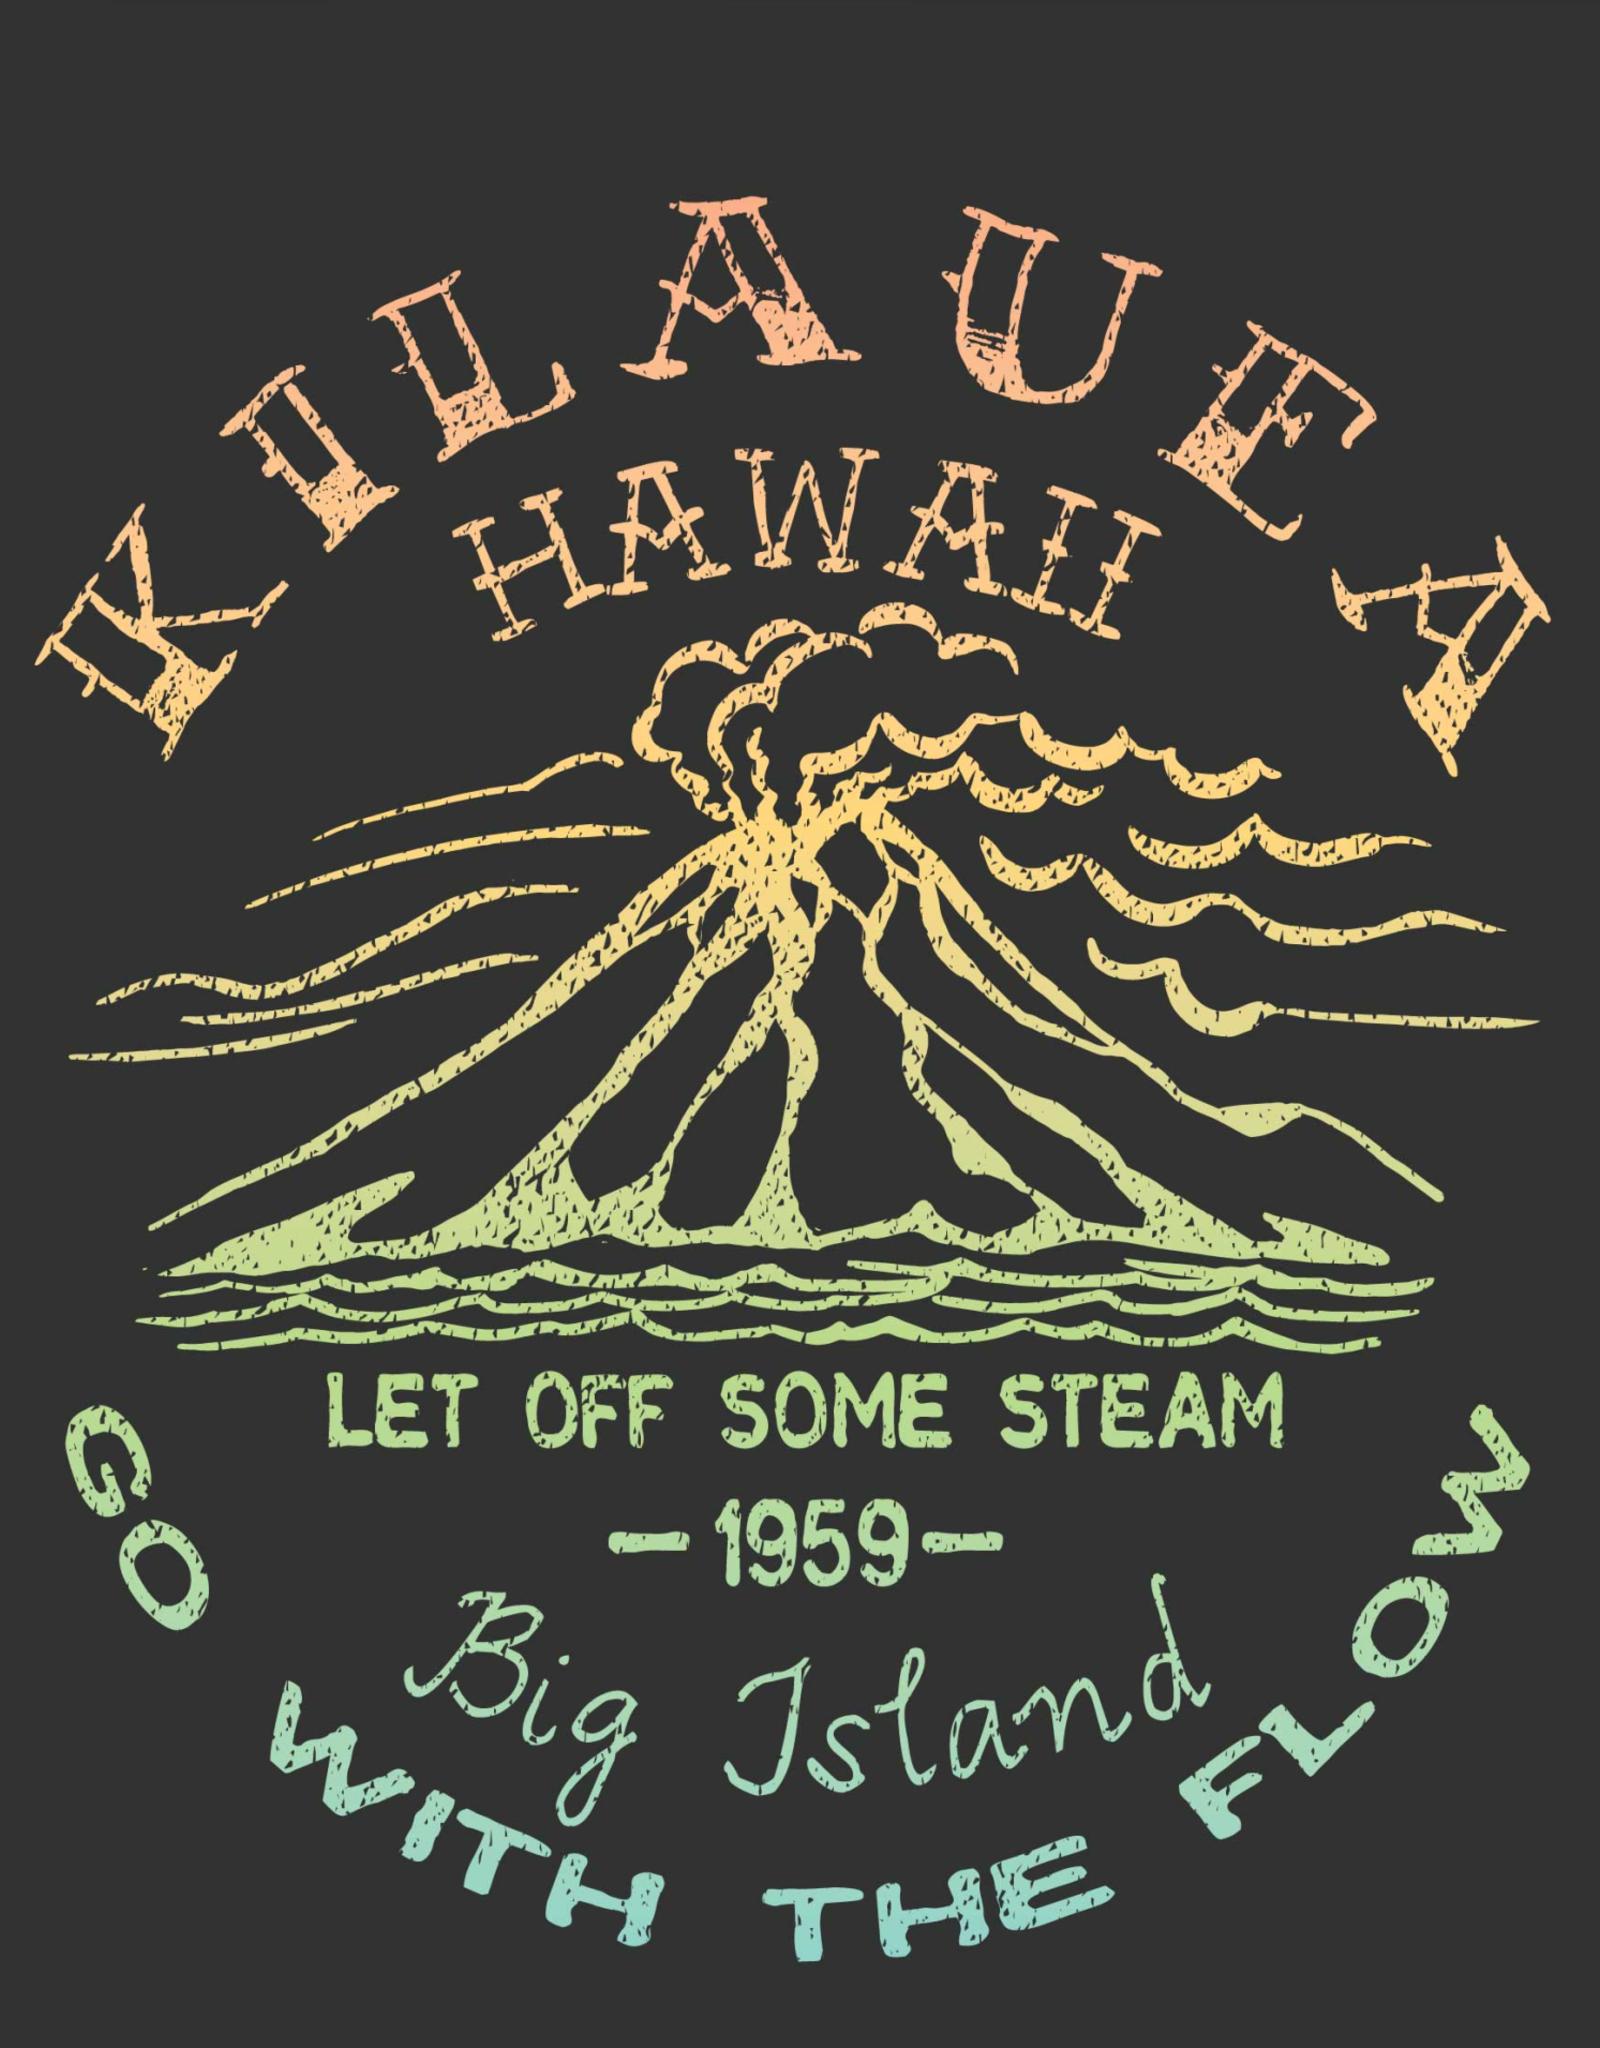 Blue 84 Lash Out V2 Volcano T-Shirt